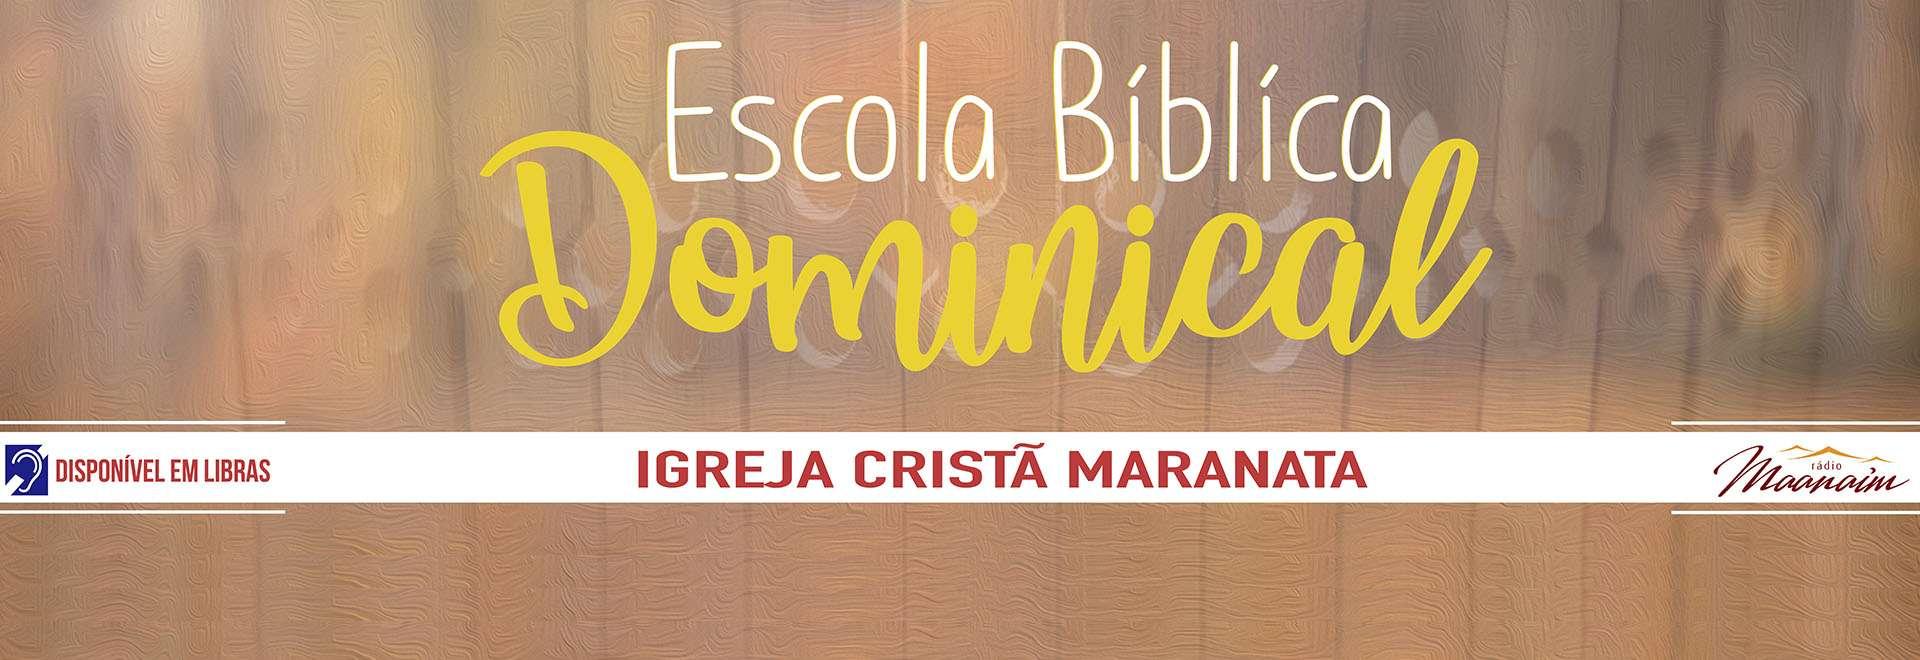 Participações da EBD da Igreja Cristã Maranata - 18/04/2021